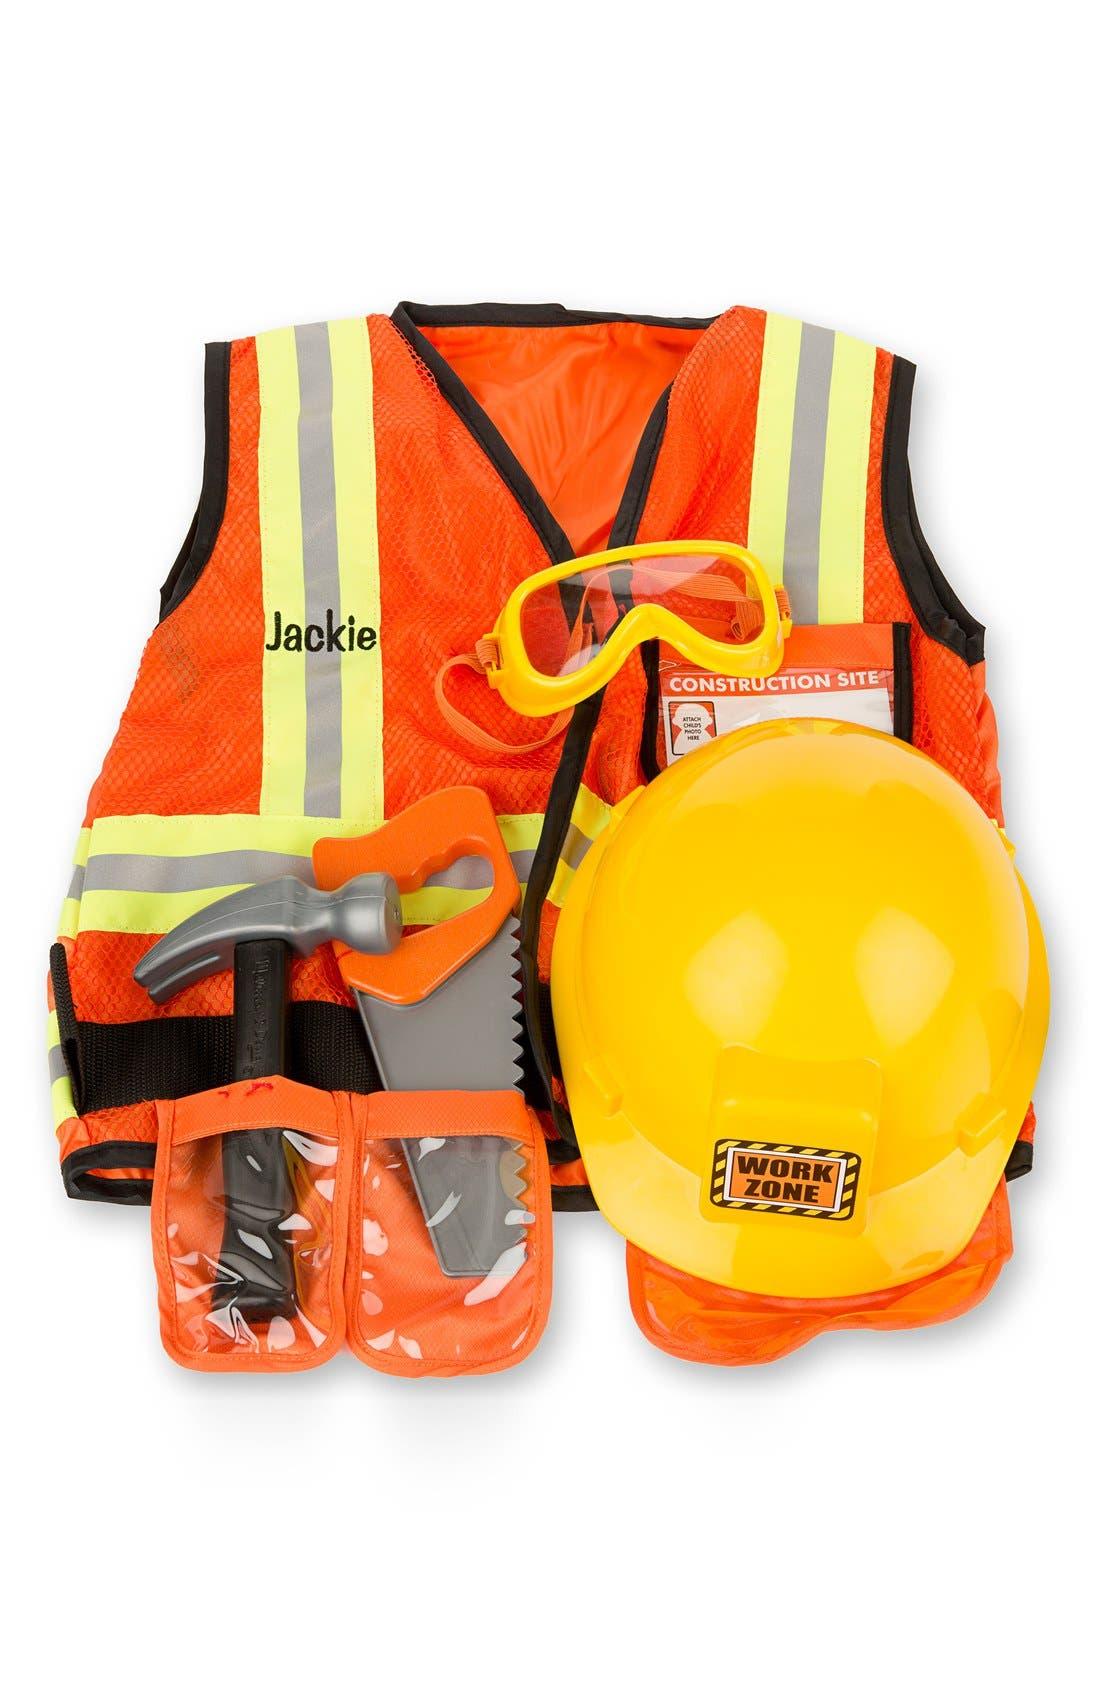 'Construction Worker' Personalized Costume Set,                         Main,                         color, Orange